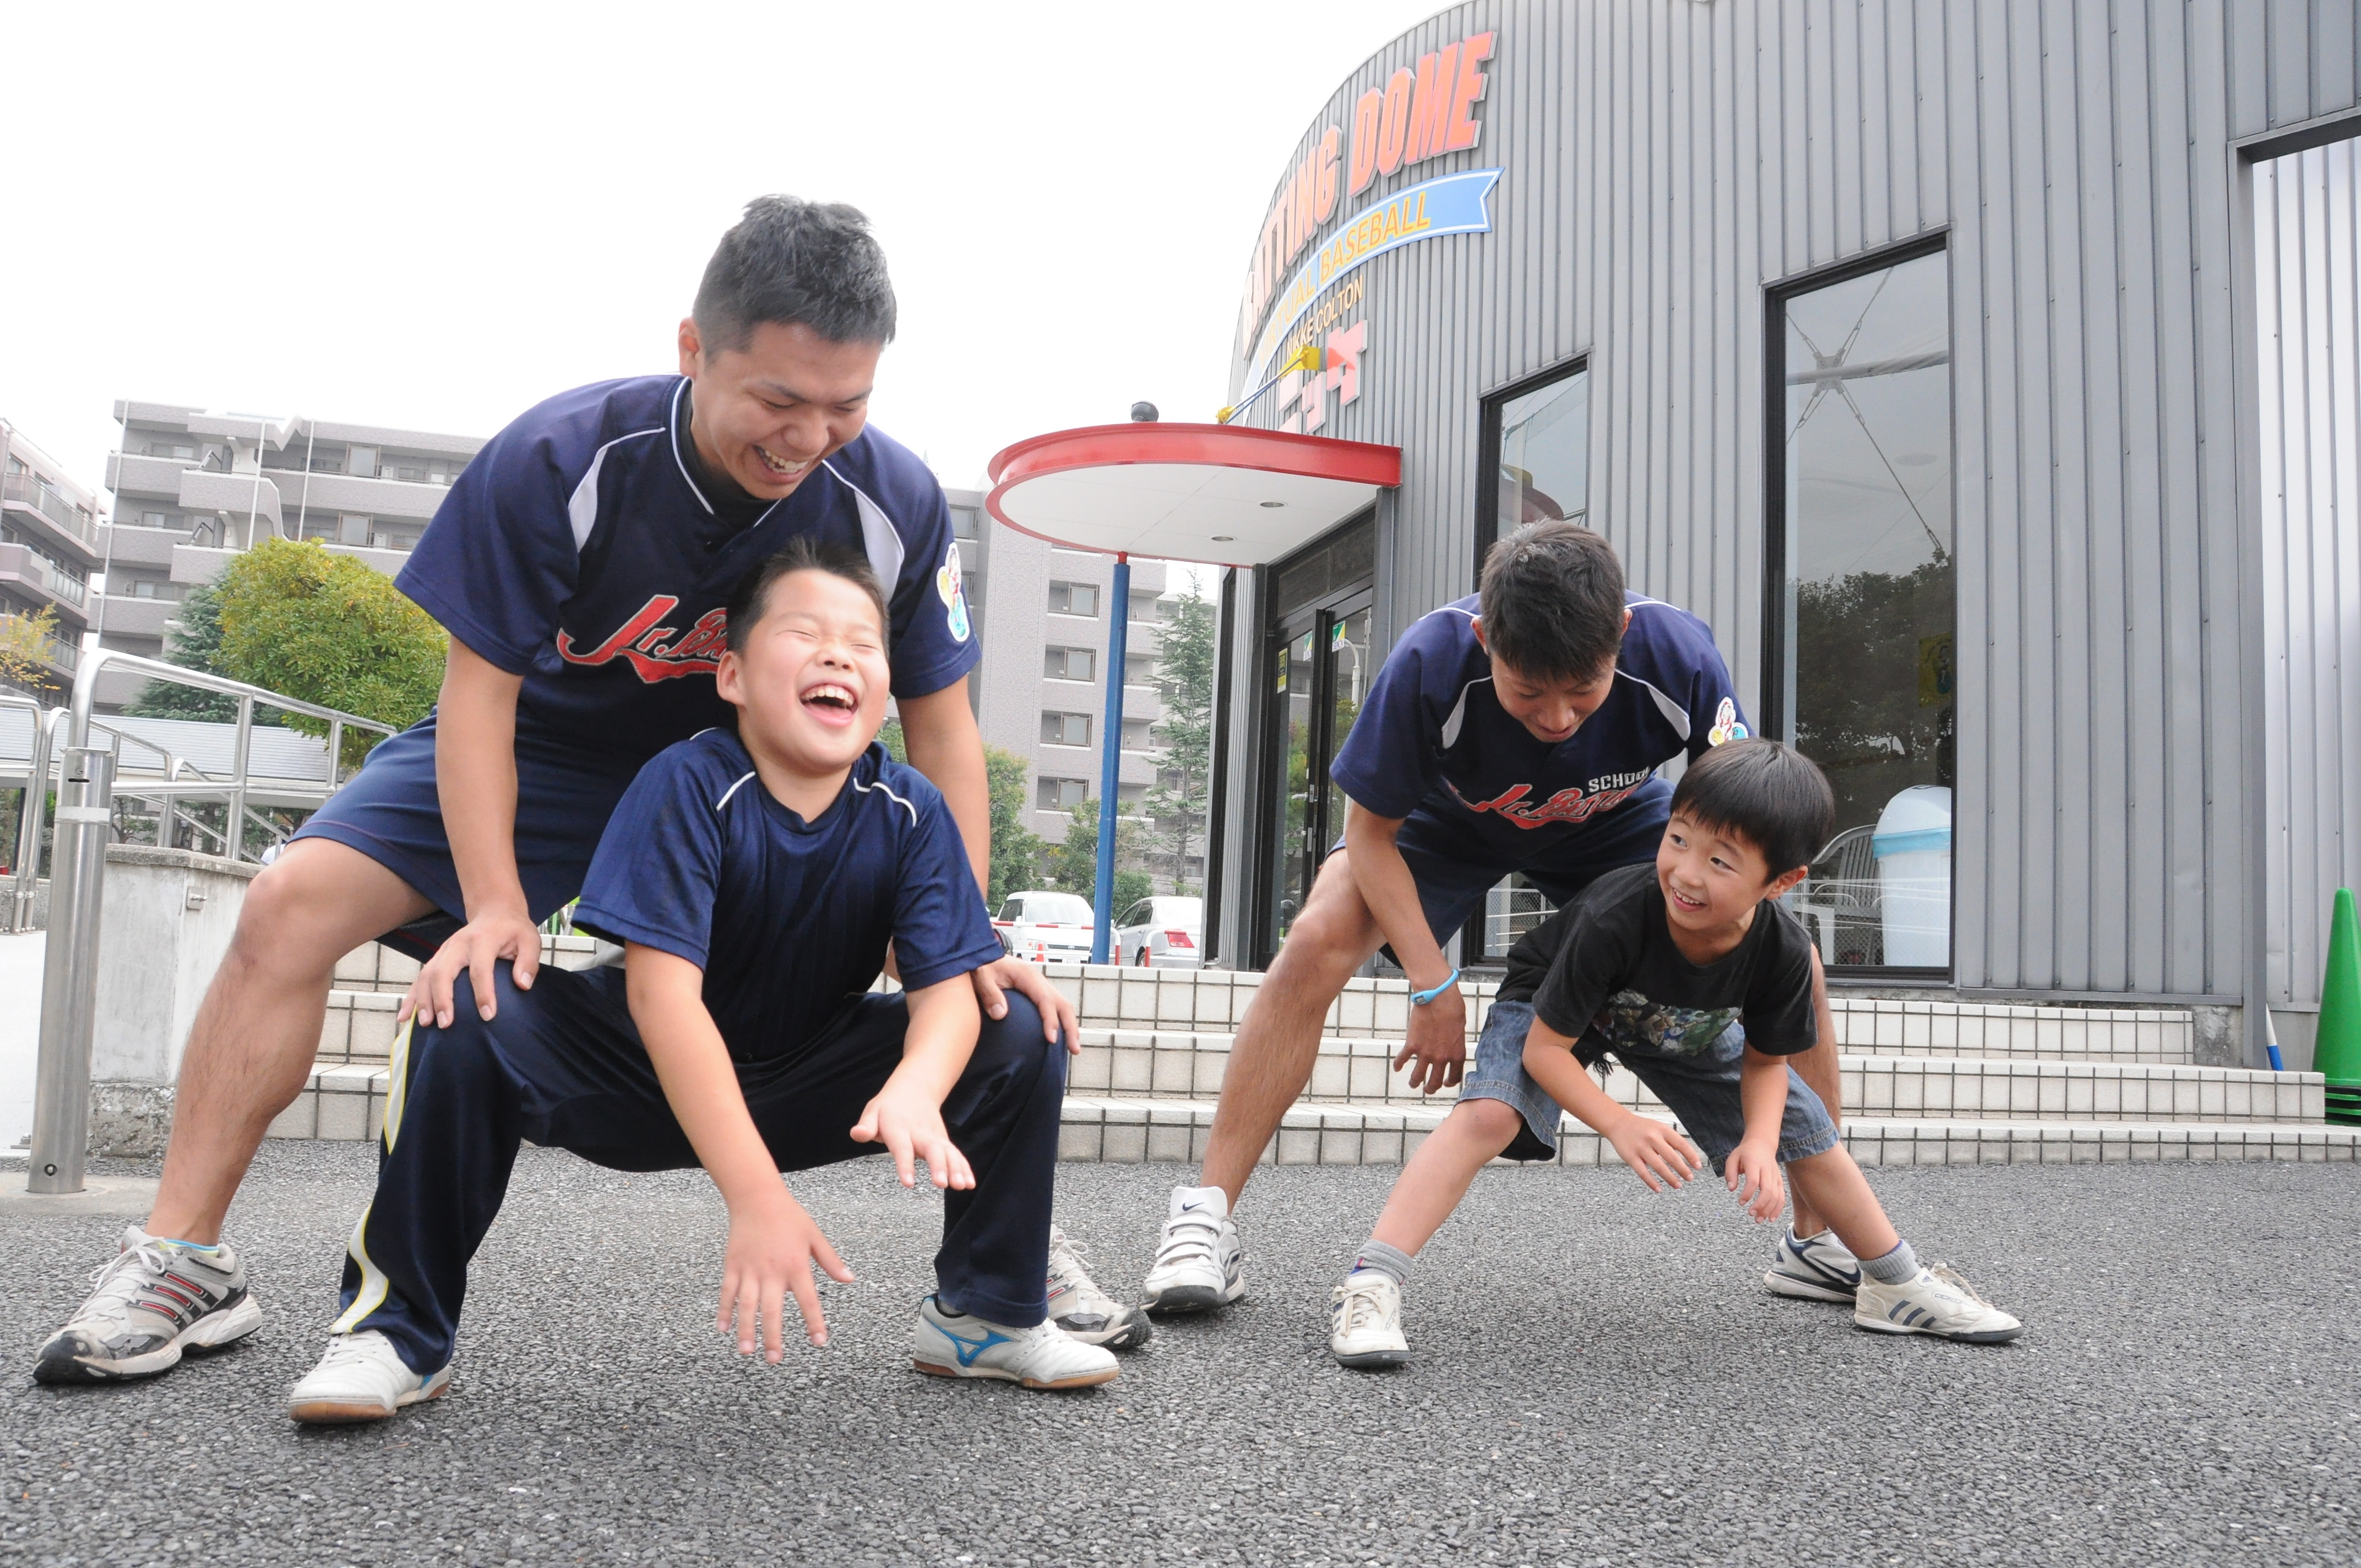 JBS(ジュニアバッティングスクール) 松阪校のアルバイト情報